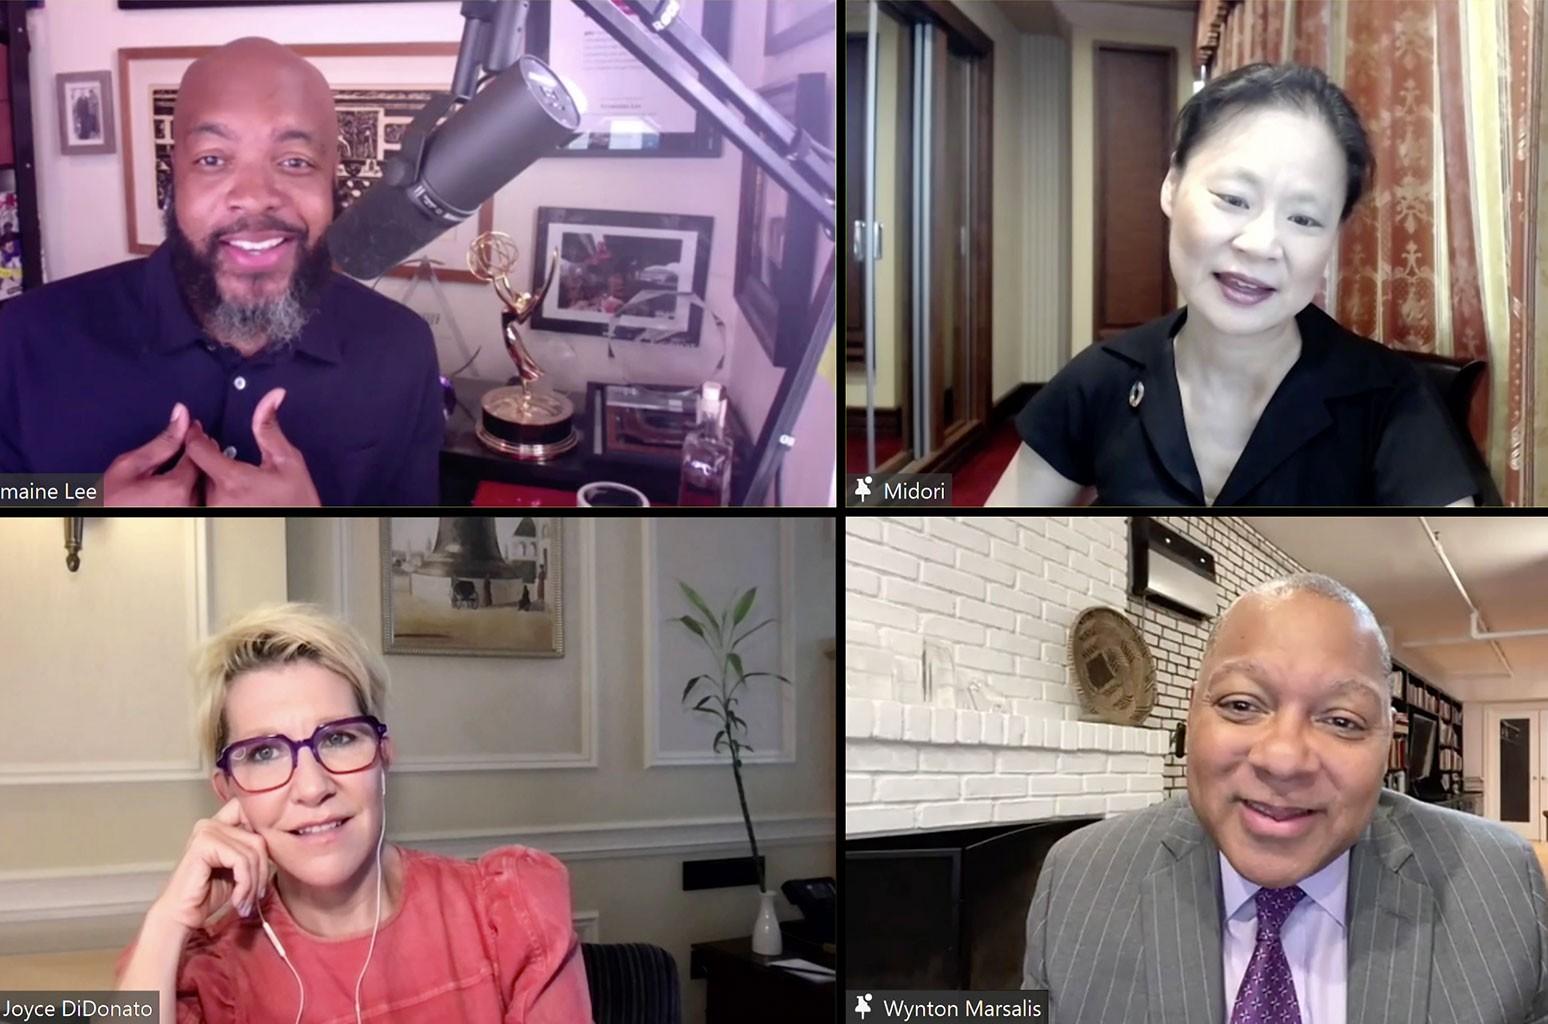 Midori, Joyce DiDonato & Wynton Marsalis Discuss How to Bring Peace Through Music in Roundtable Chat